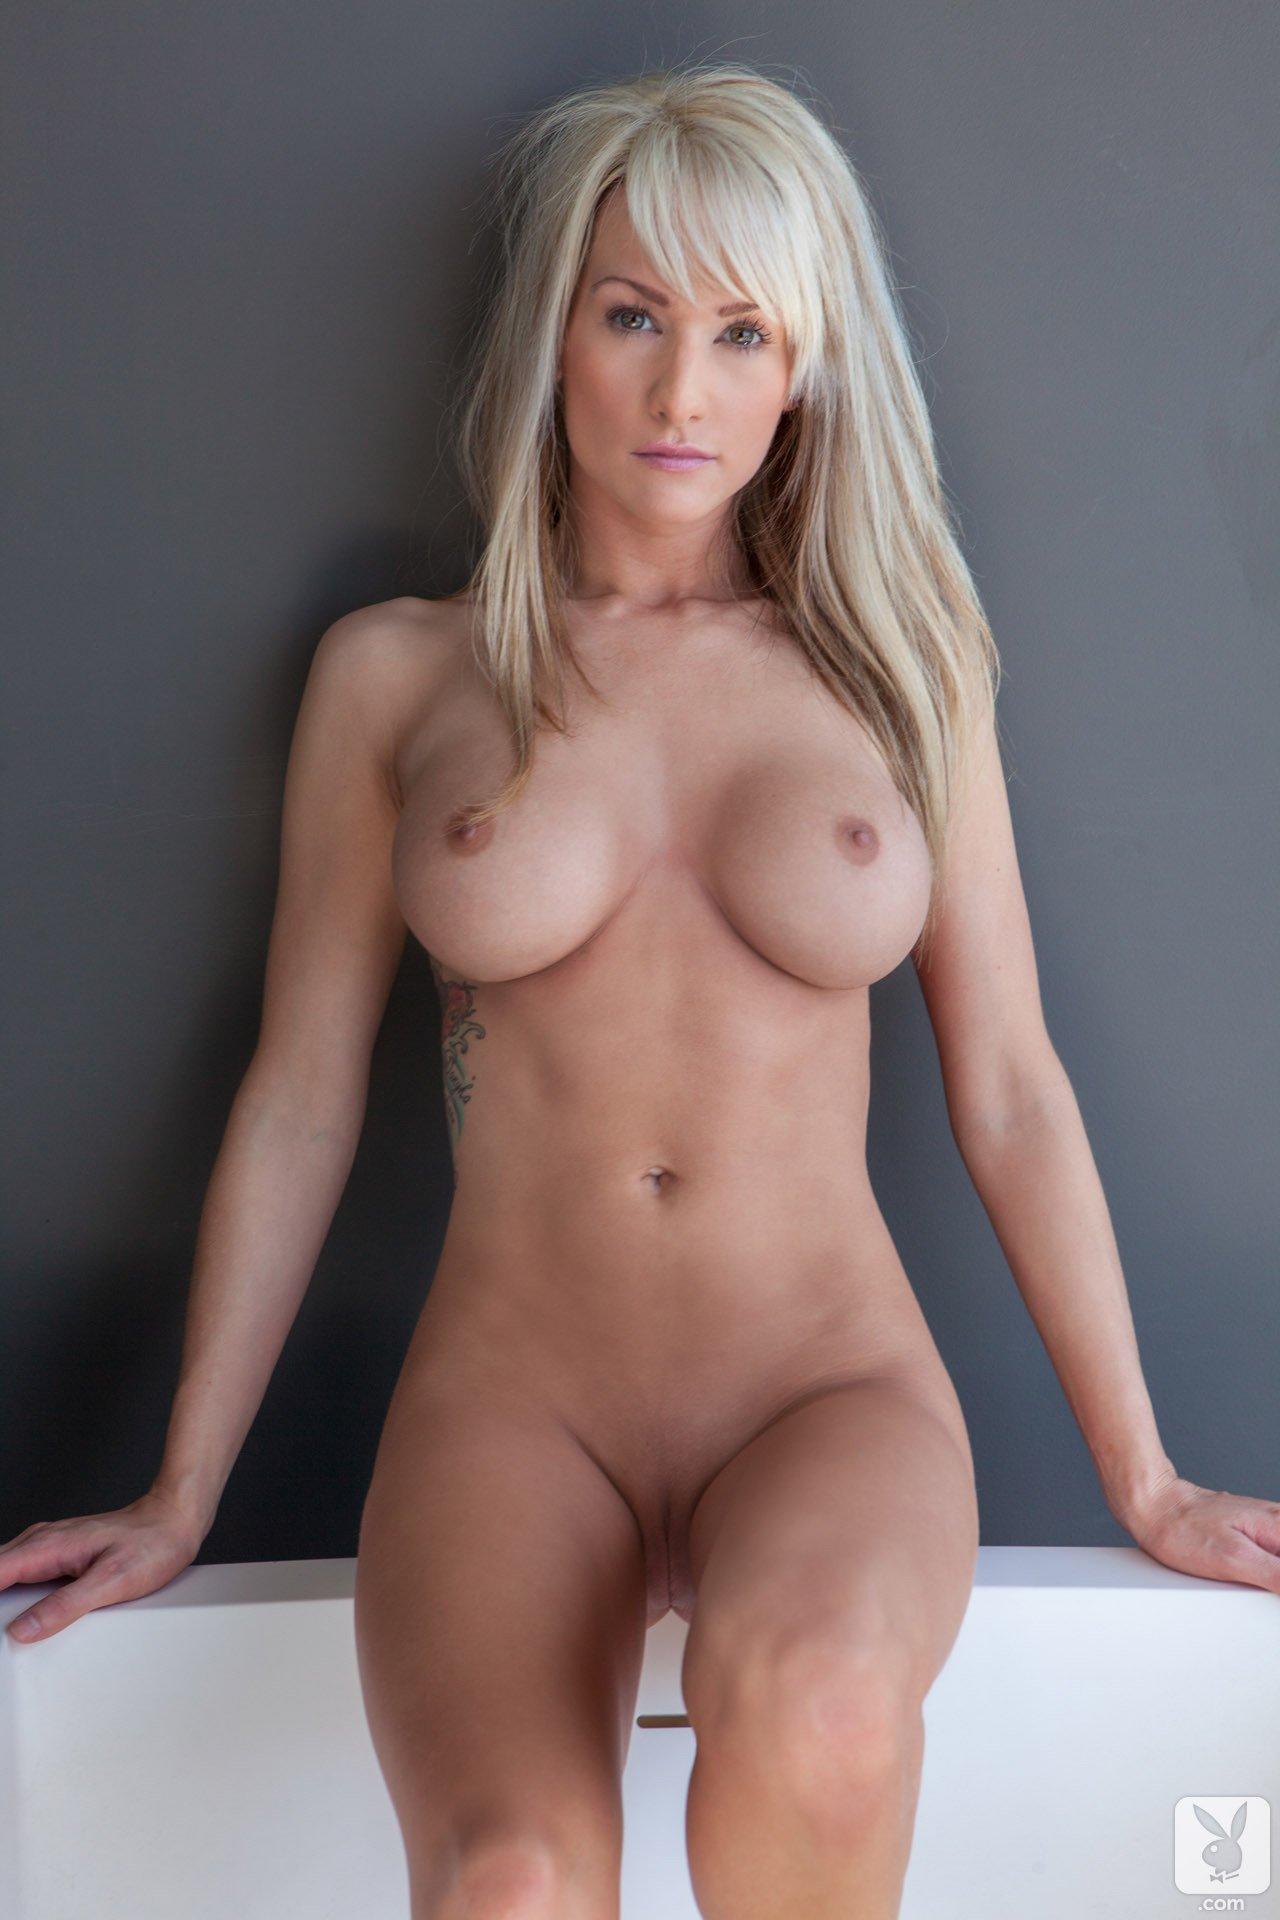 jessie-ann-blonde-boobs-bathtube-naked-playboy-13